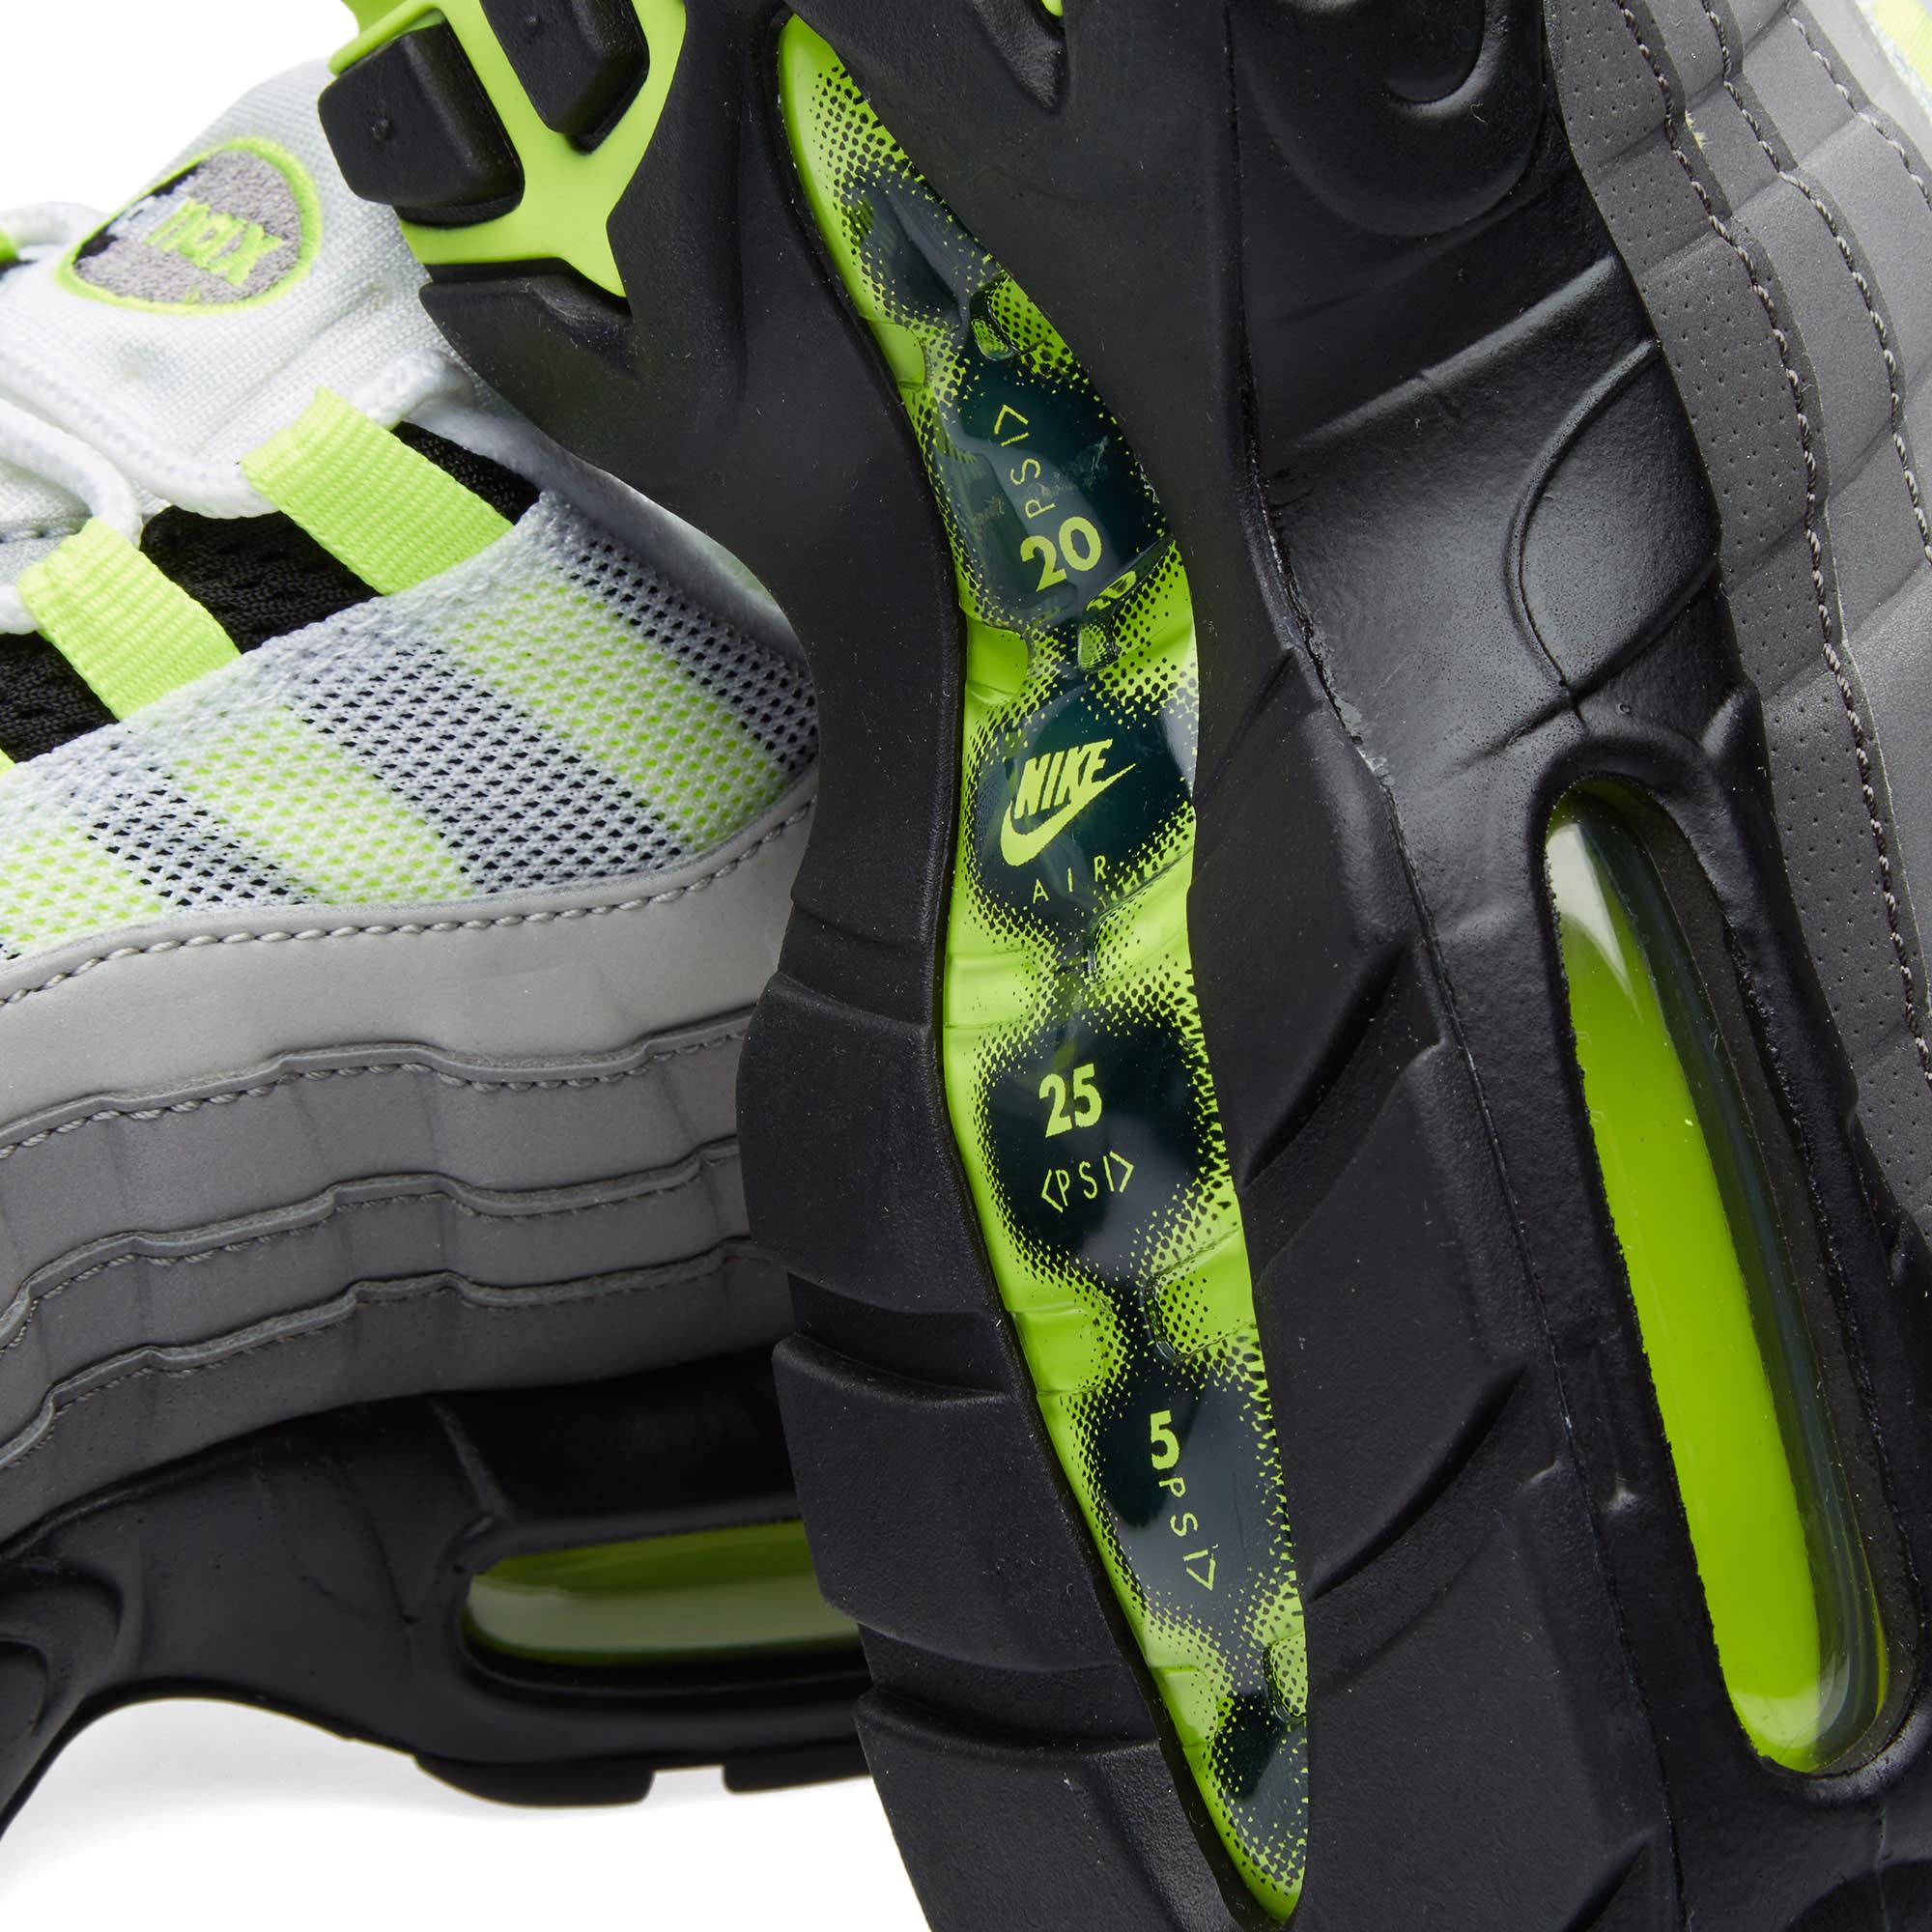 uk availability acc5f 56f36 Nike Air Max 95 OG Premium Leather  Reflective  Black, Volt   Medium Ash    END.